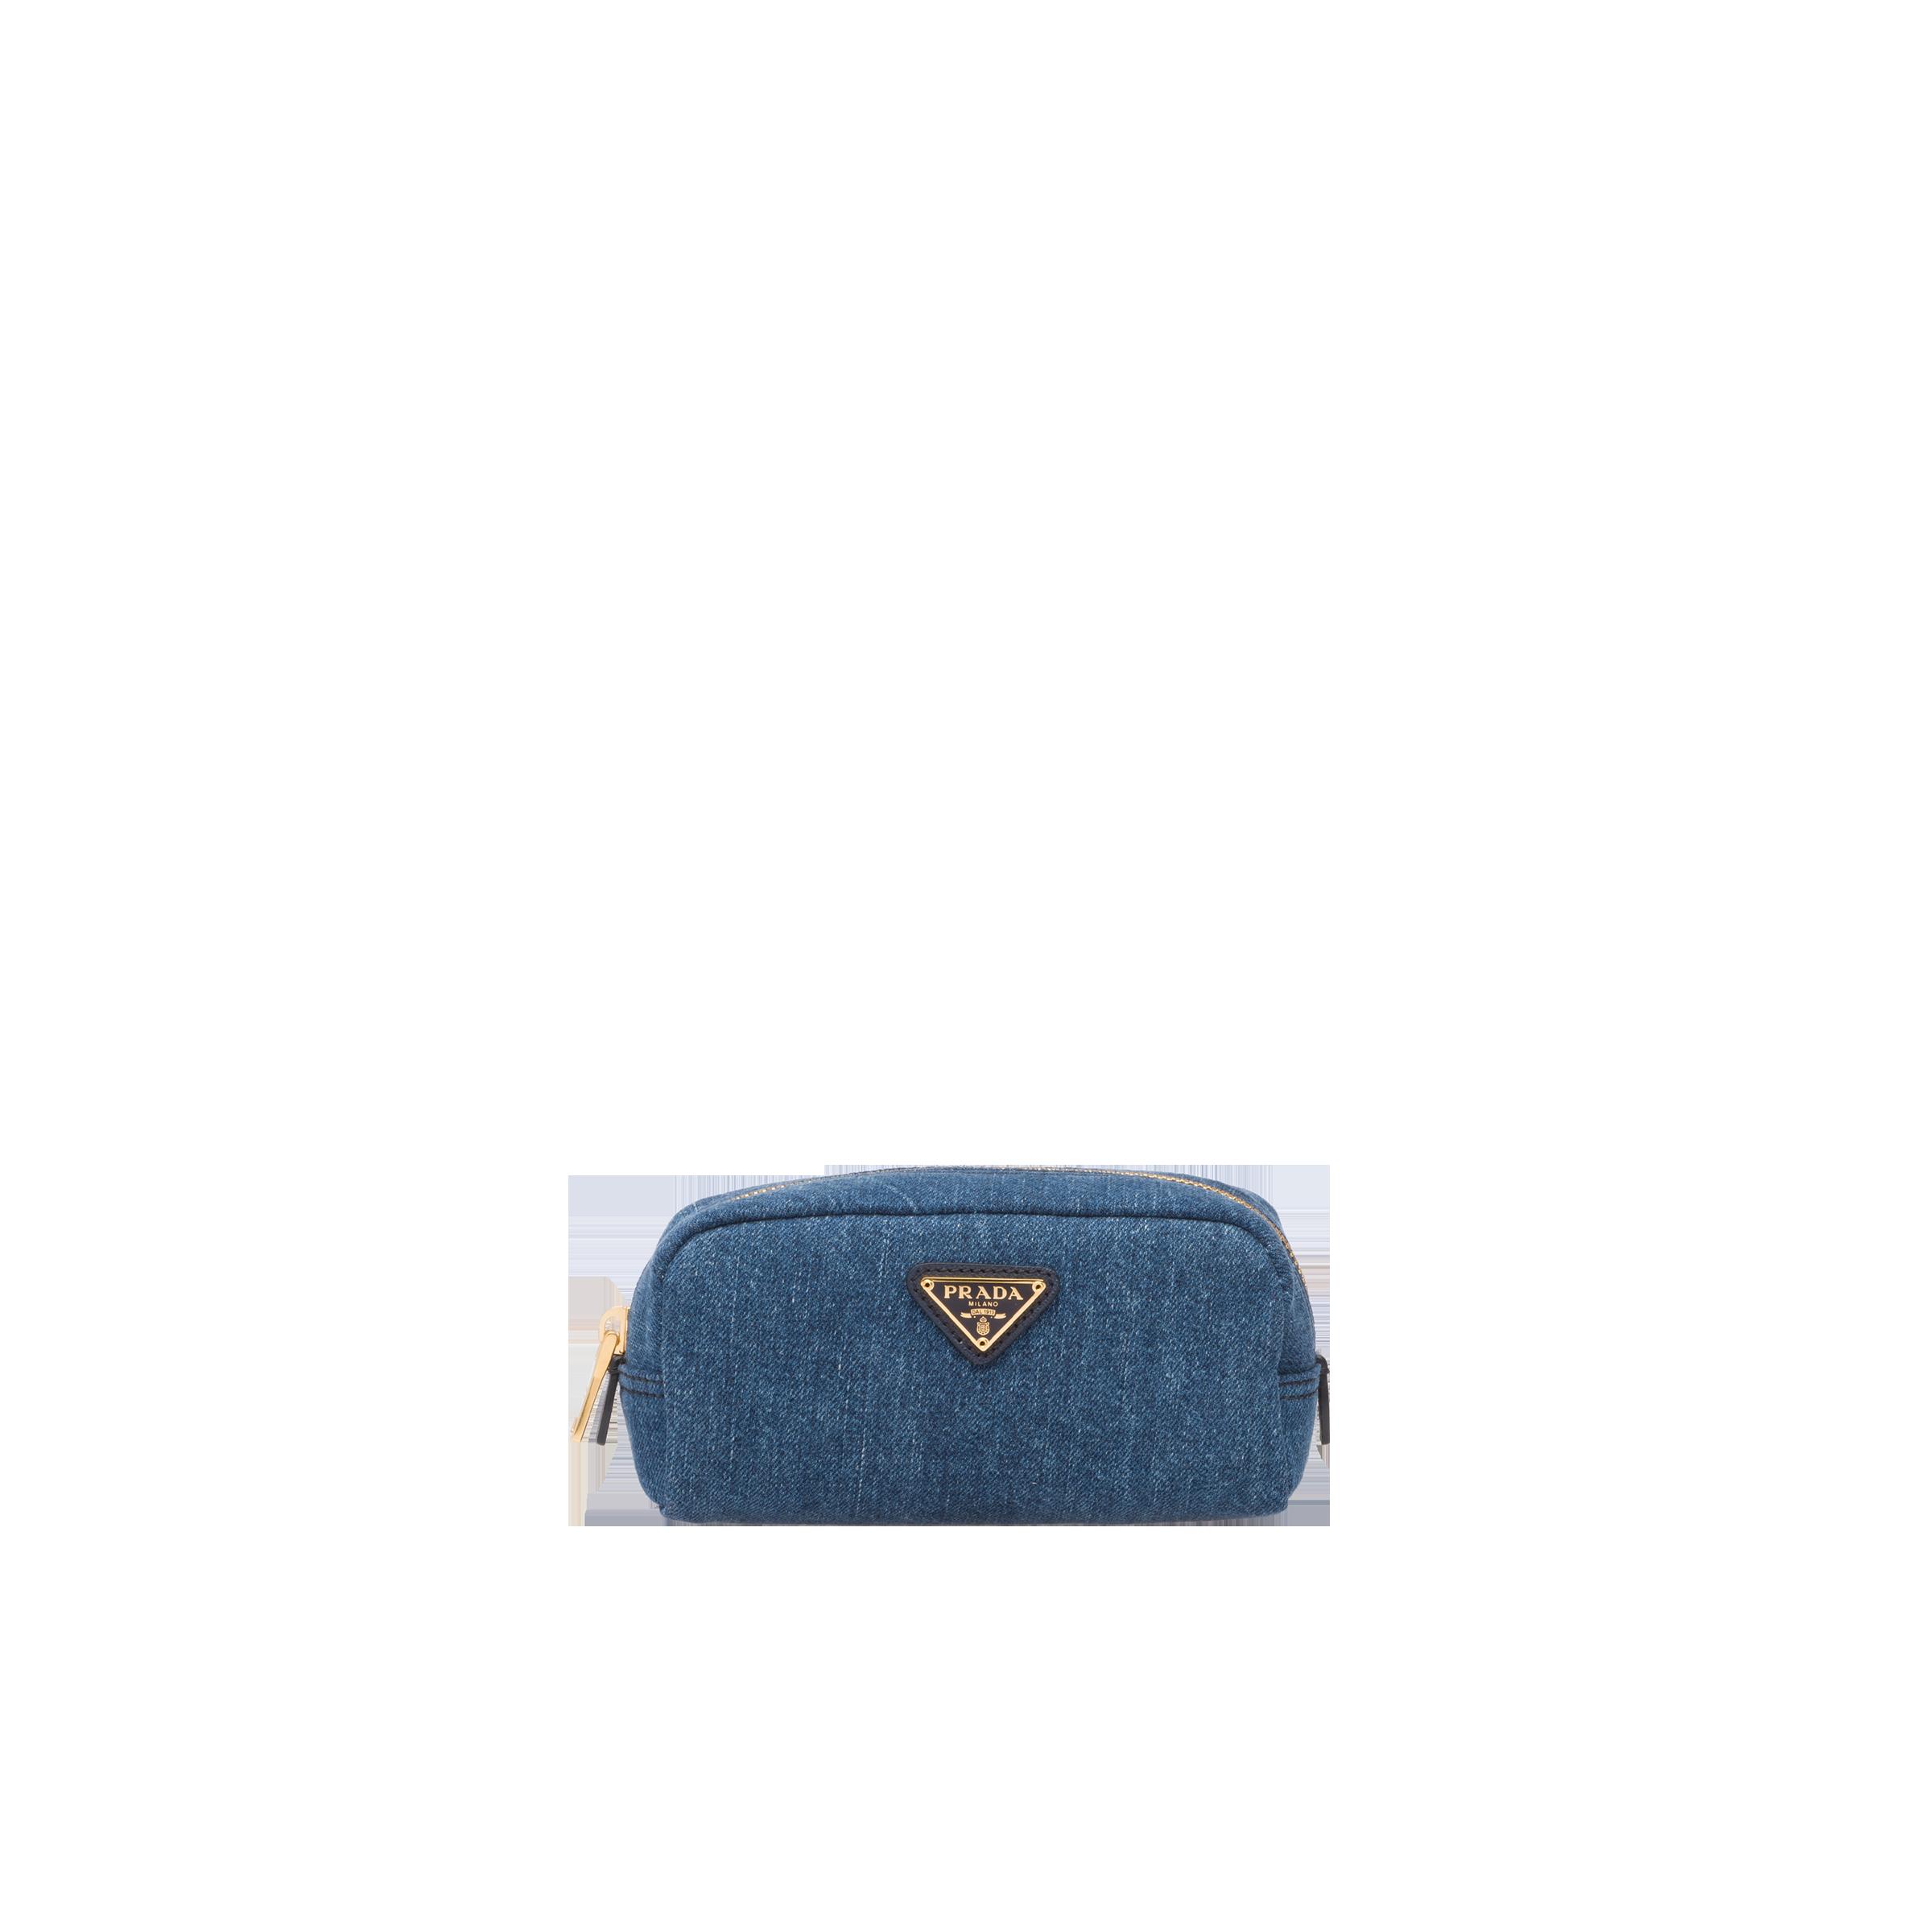 259b20d7be1f Denim Cosmetic Pouch | Prada - 1NA175_AJ6_F0008